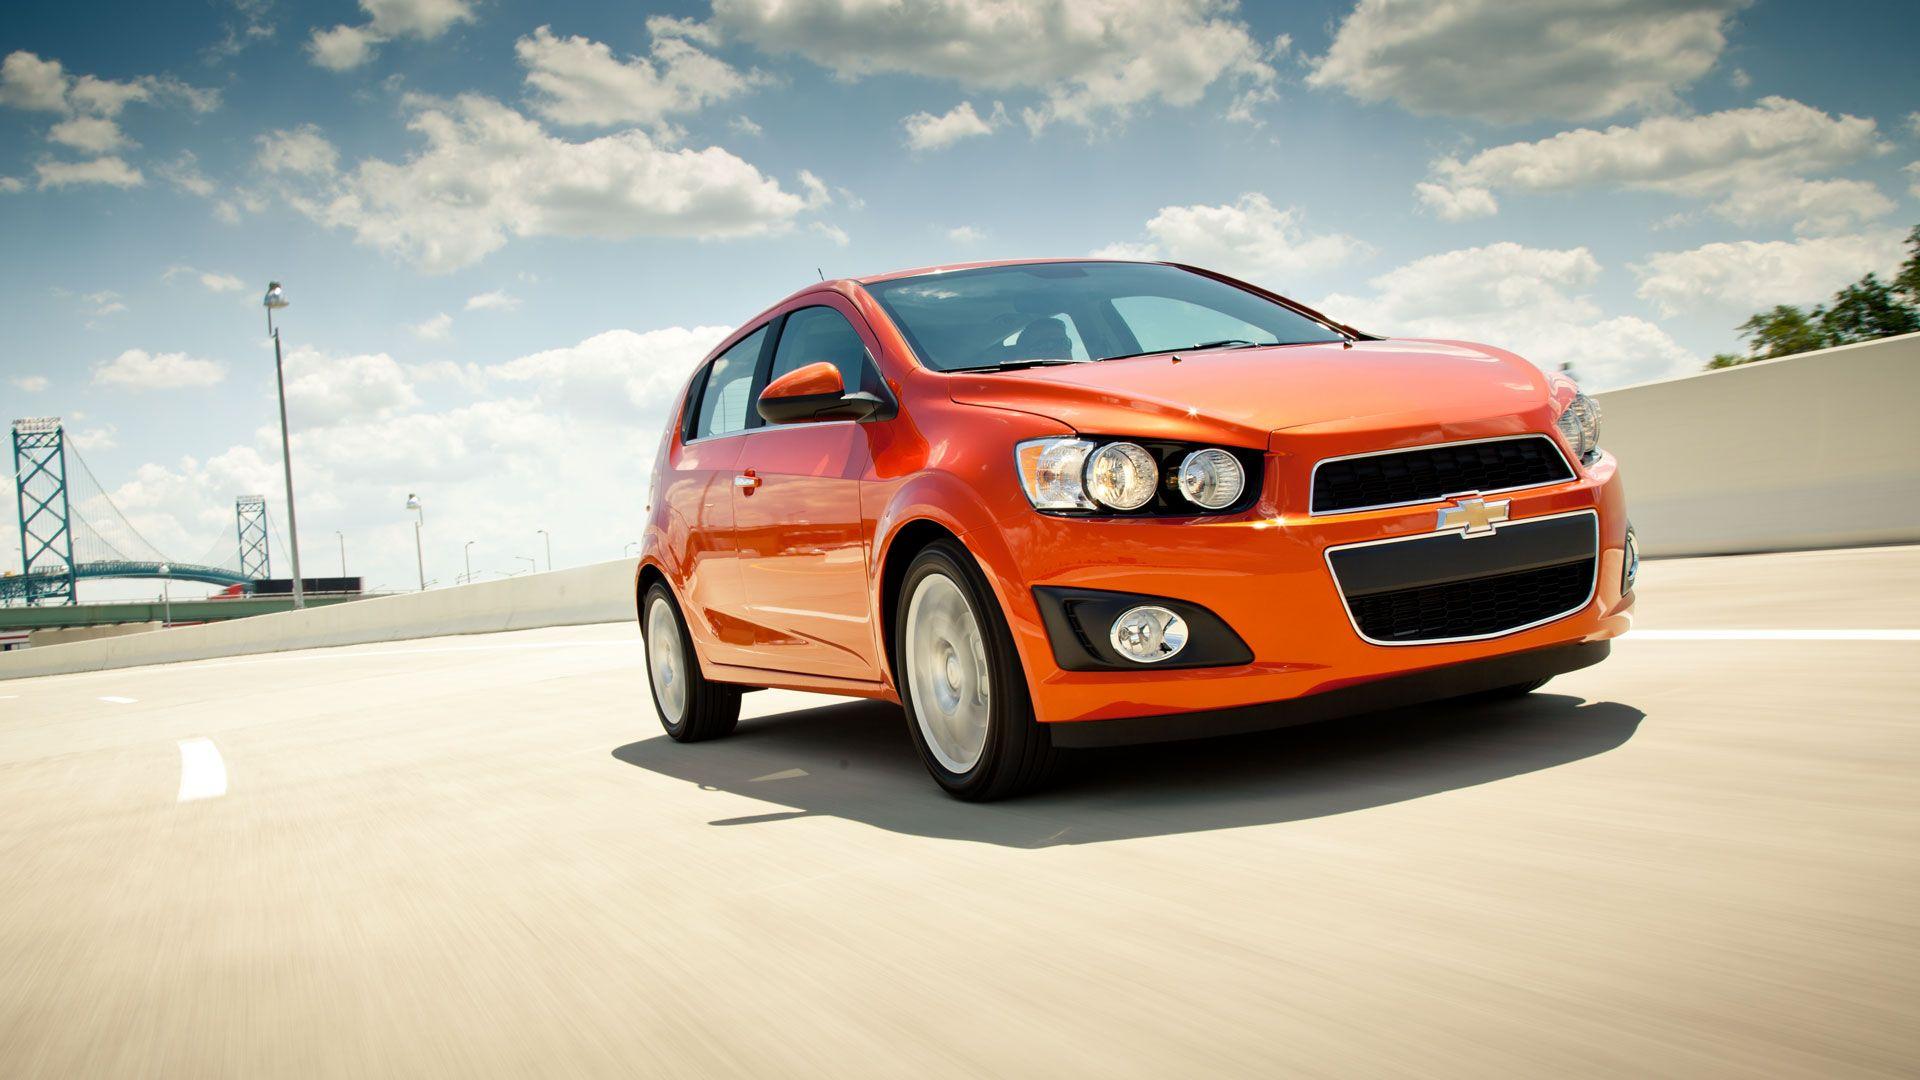 General Motors 2012 Chevrolet Sonic Hatchback GM